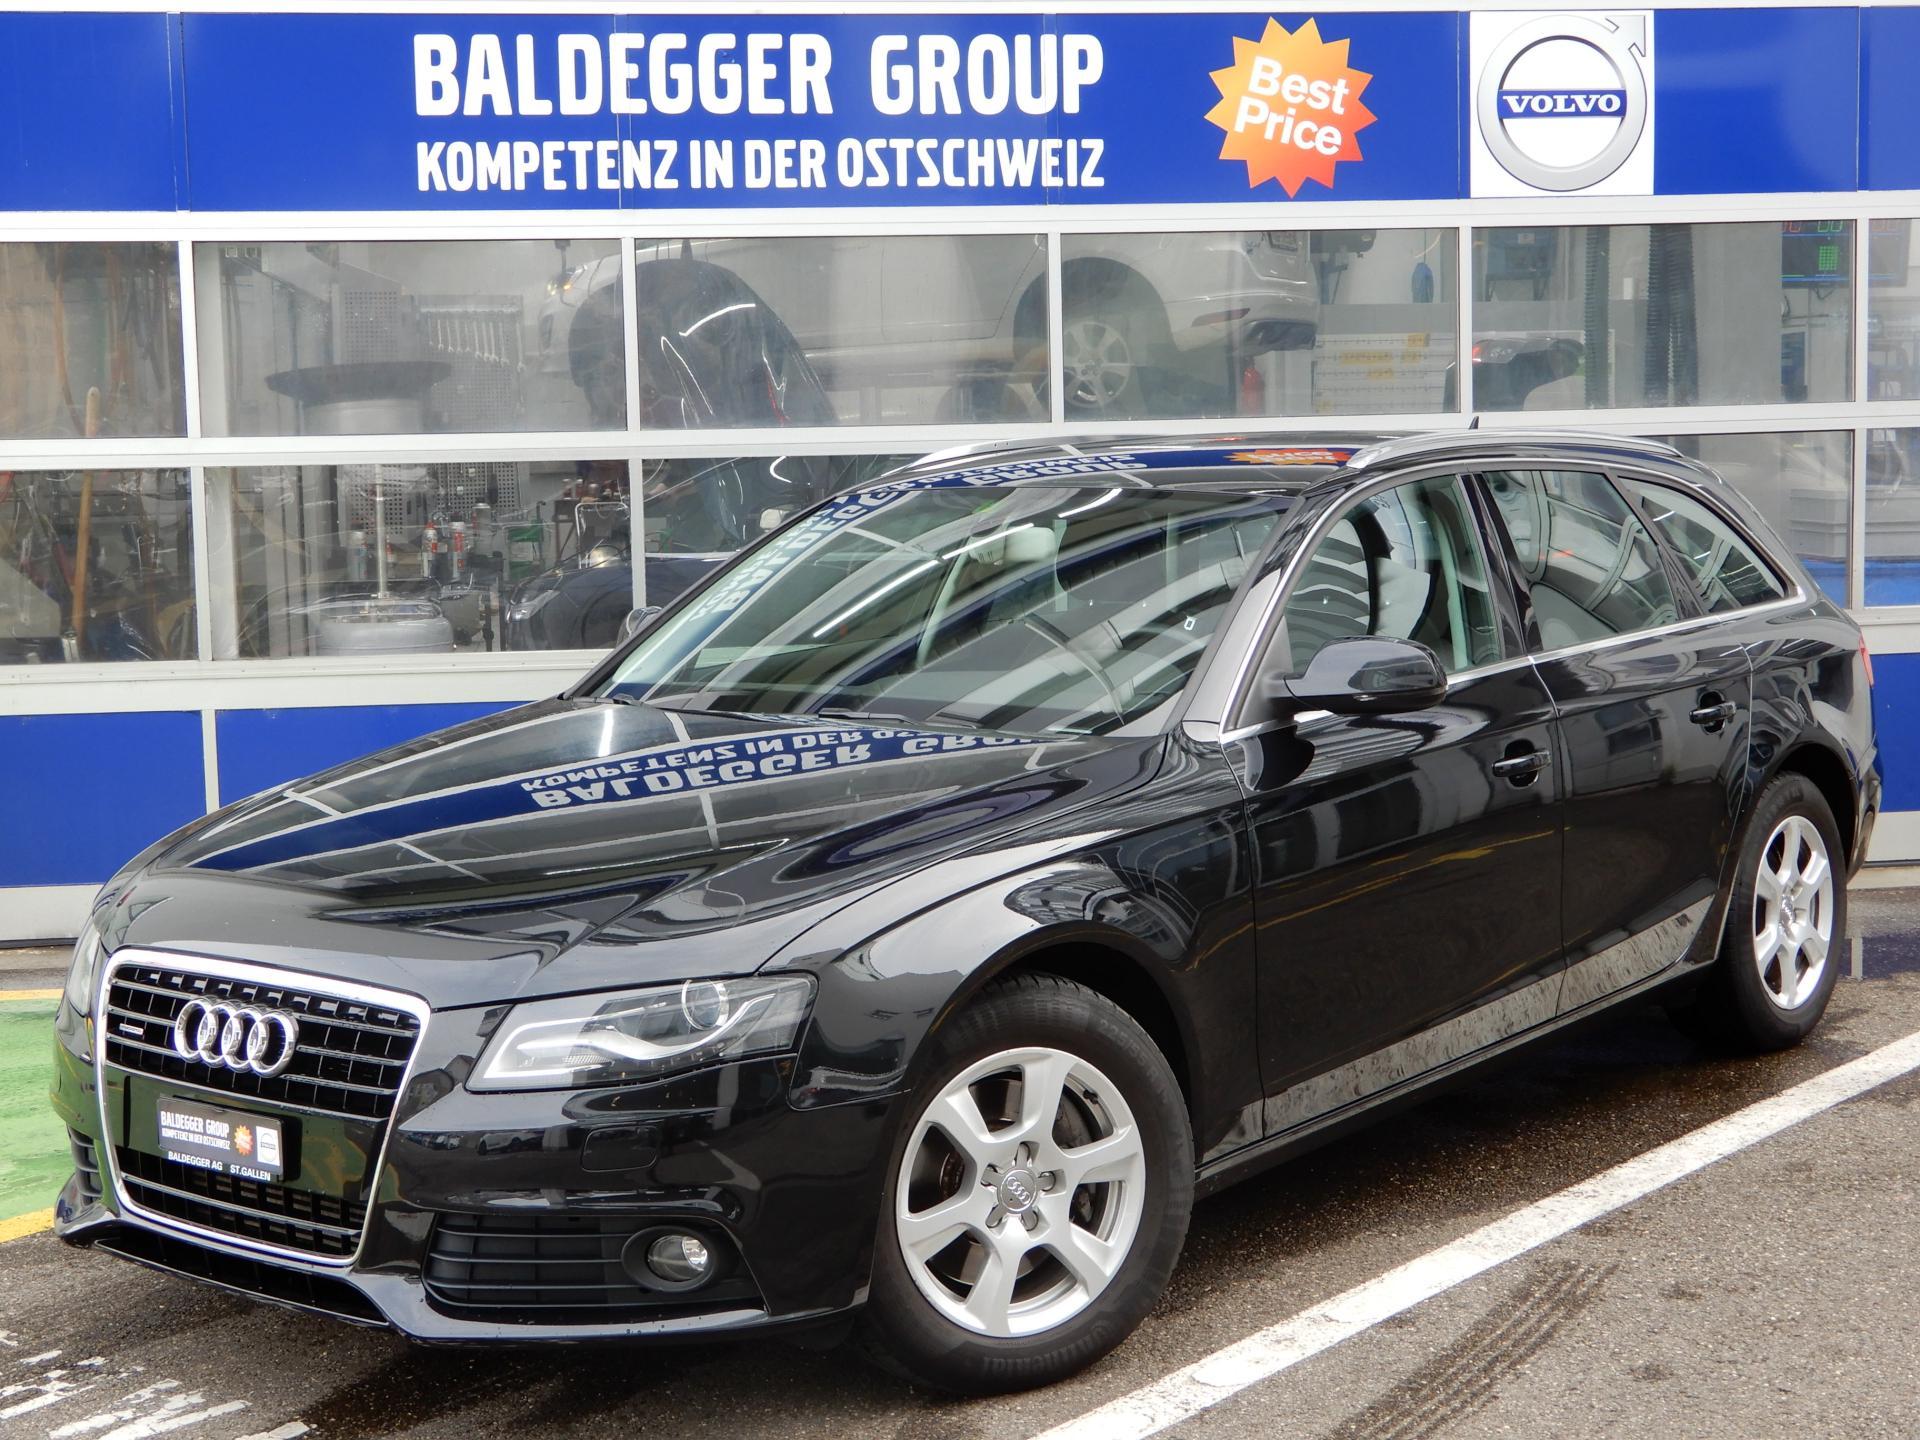 Audi A4 Avant 30 Tdi Quattro Baldegger Automobile Ag